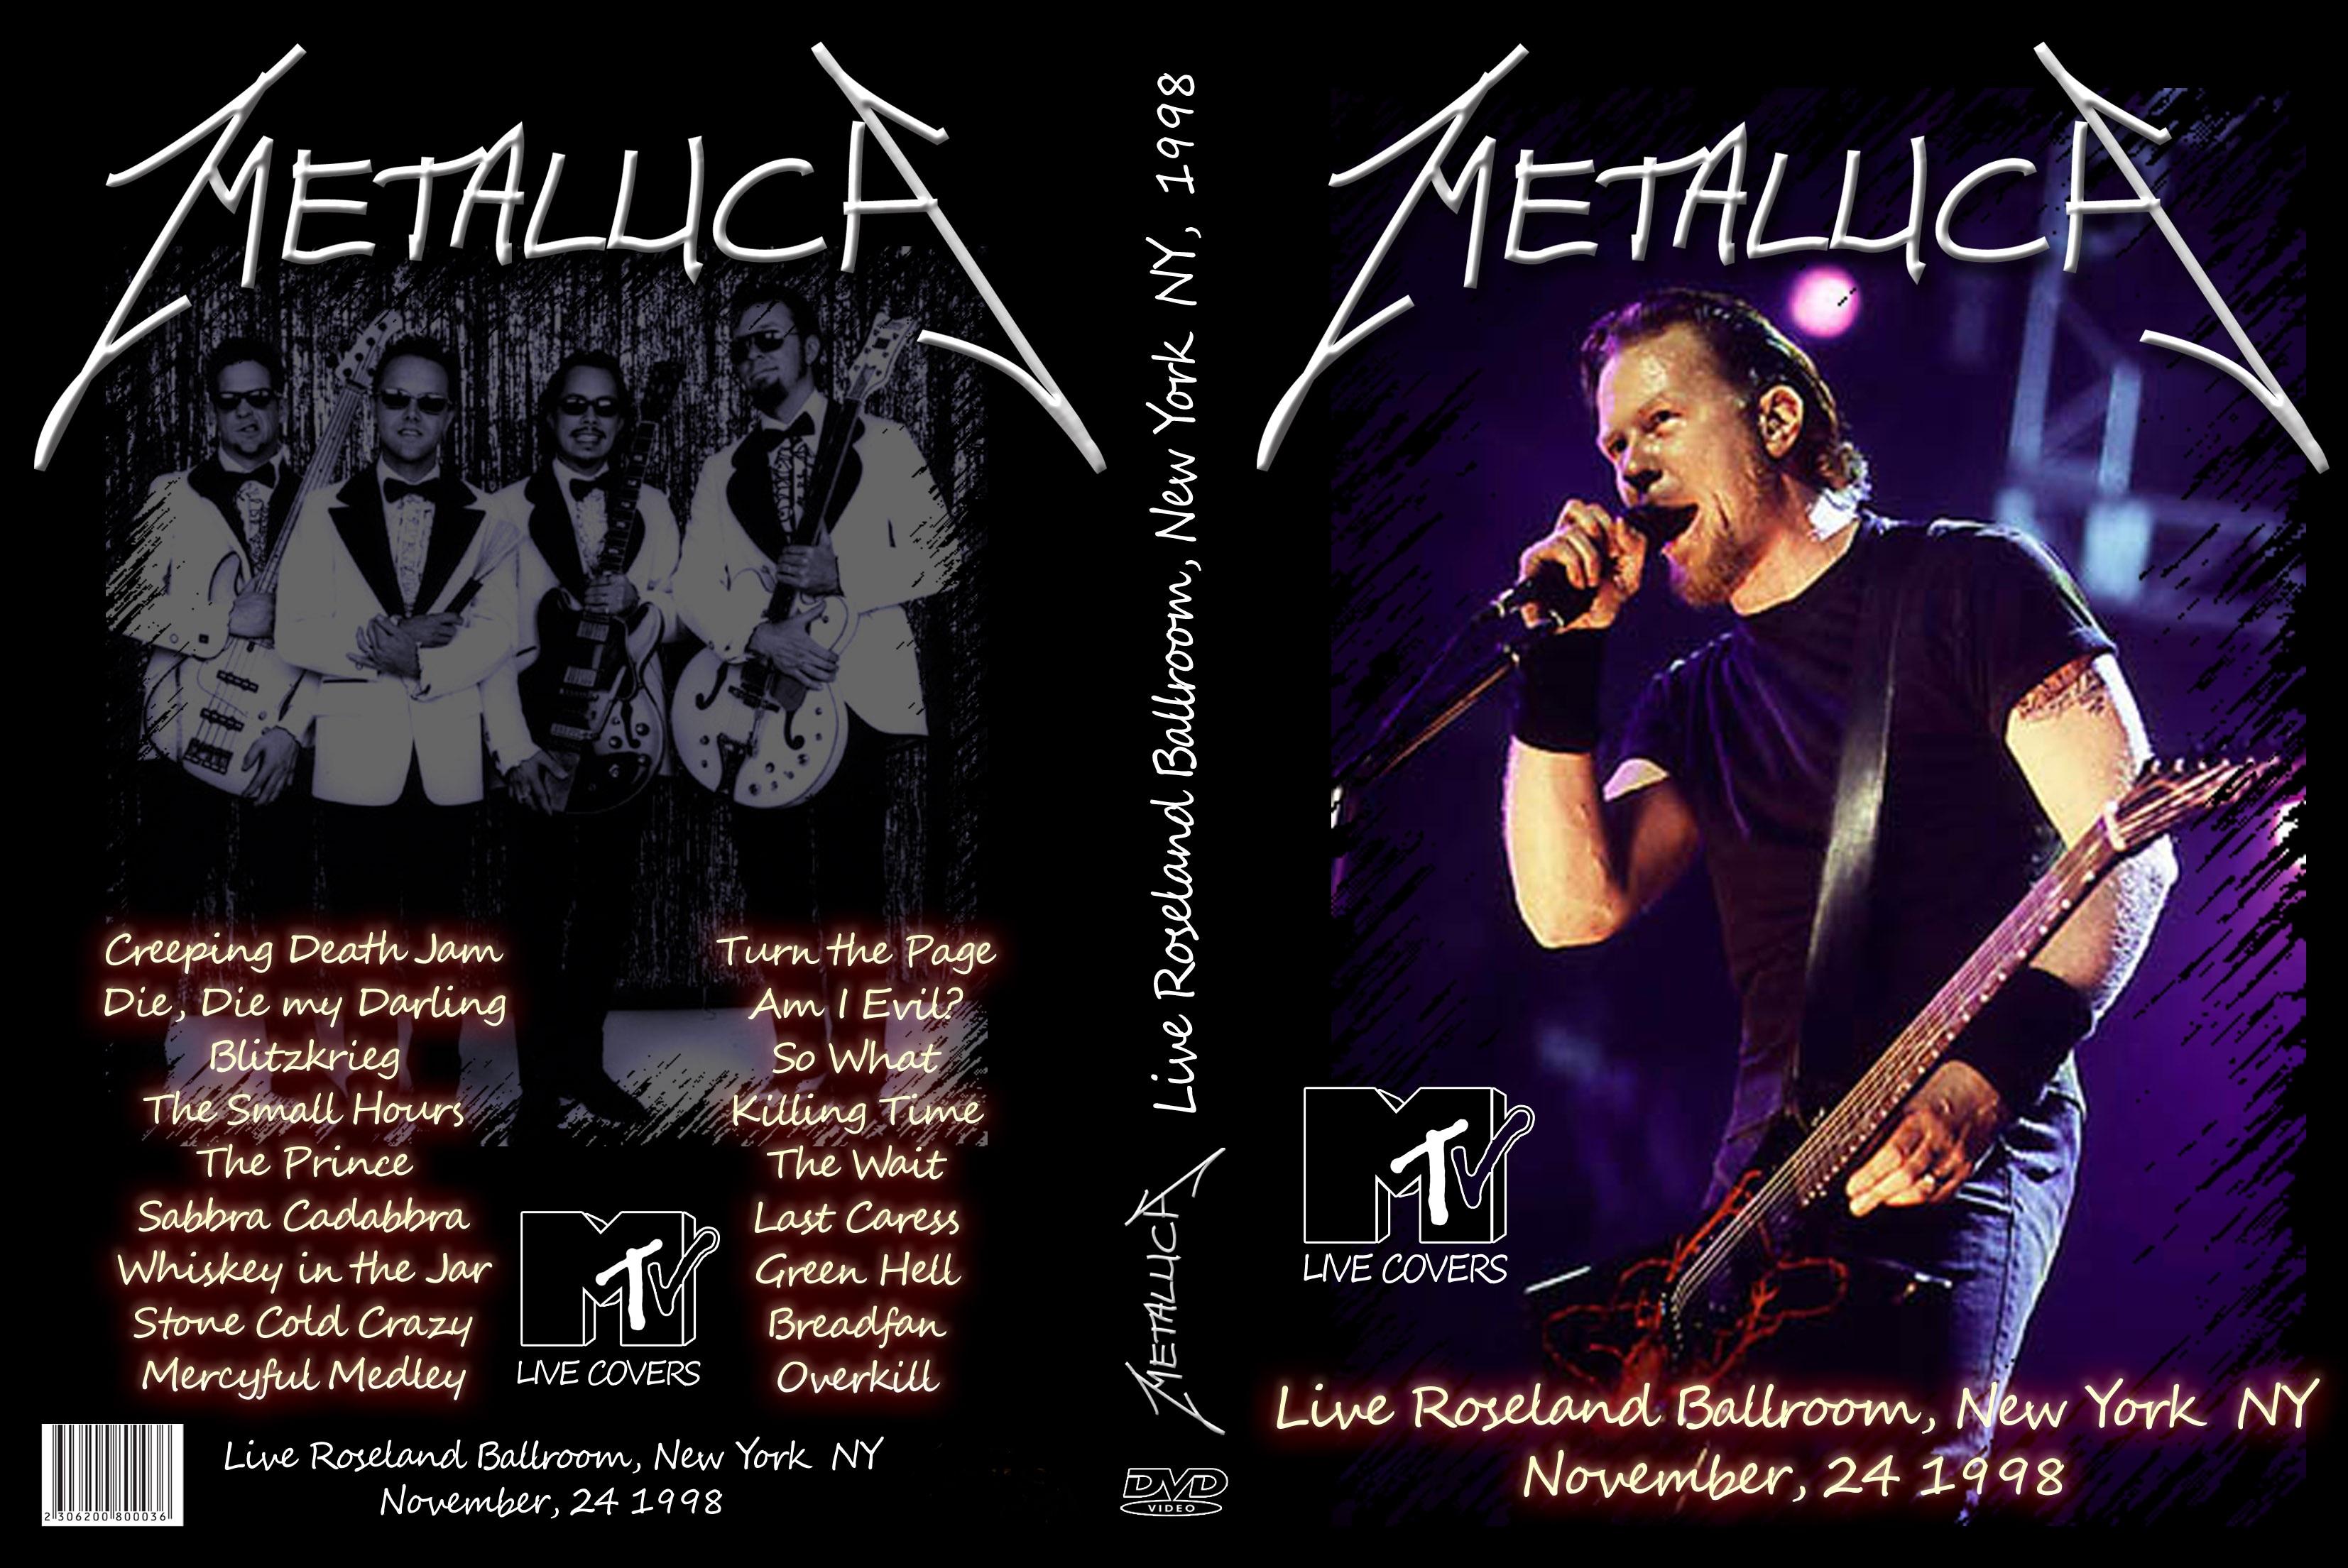 Metallica - Live in New York 98